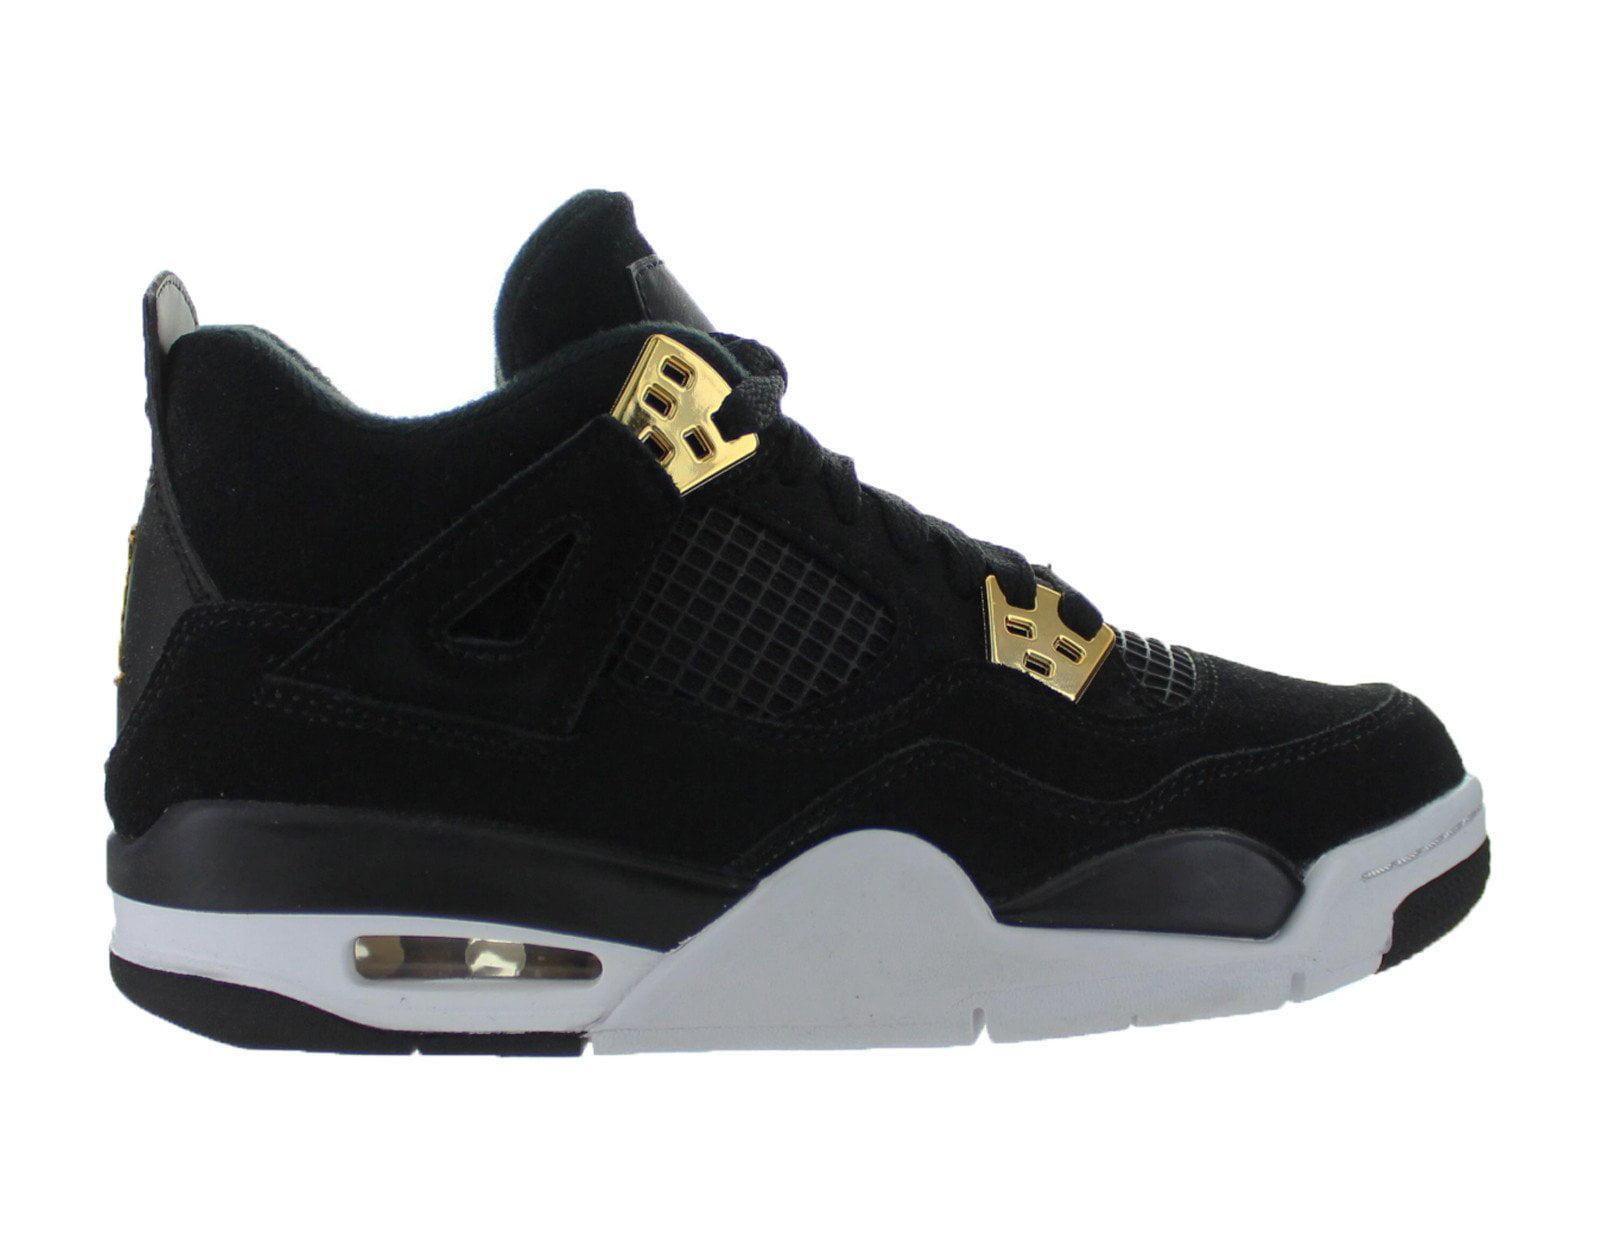 Jordan - Kids Air Jordan 4 IV Retro GS Royalty Black Gold 408452-032 -  Walmart.com 04953bac2